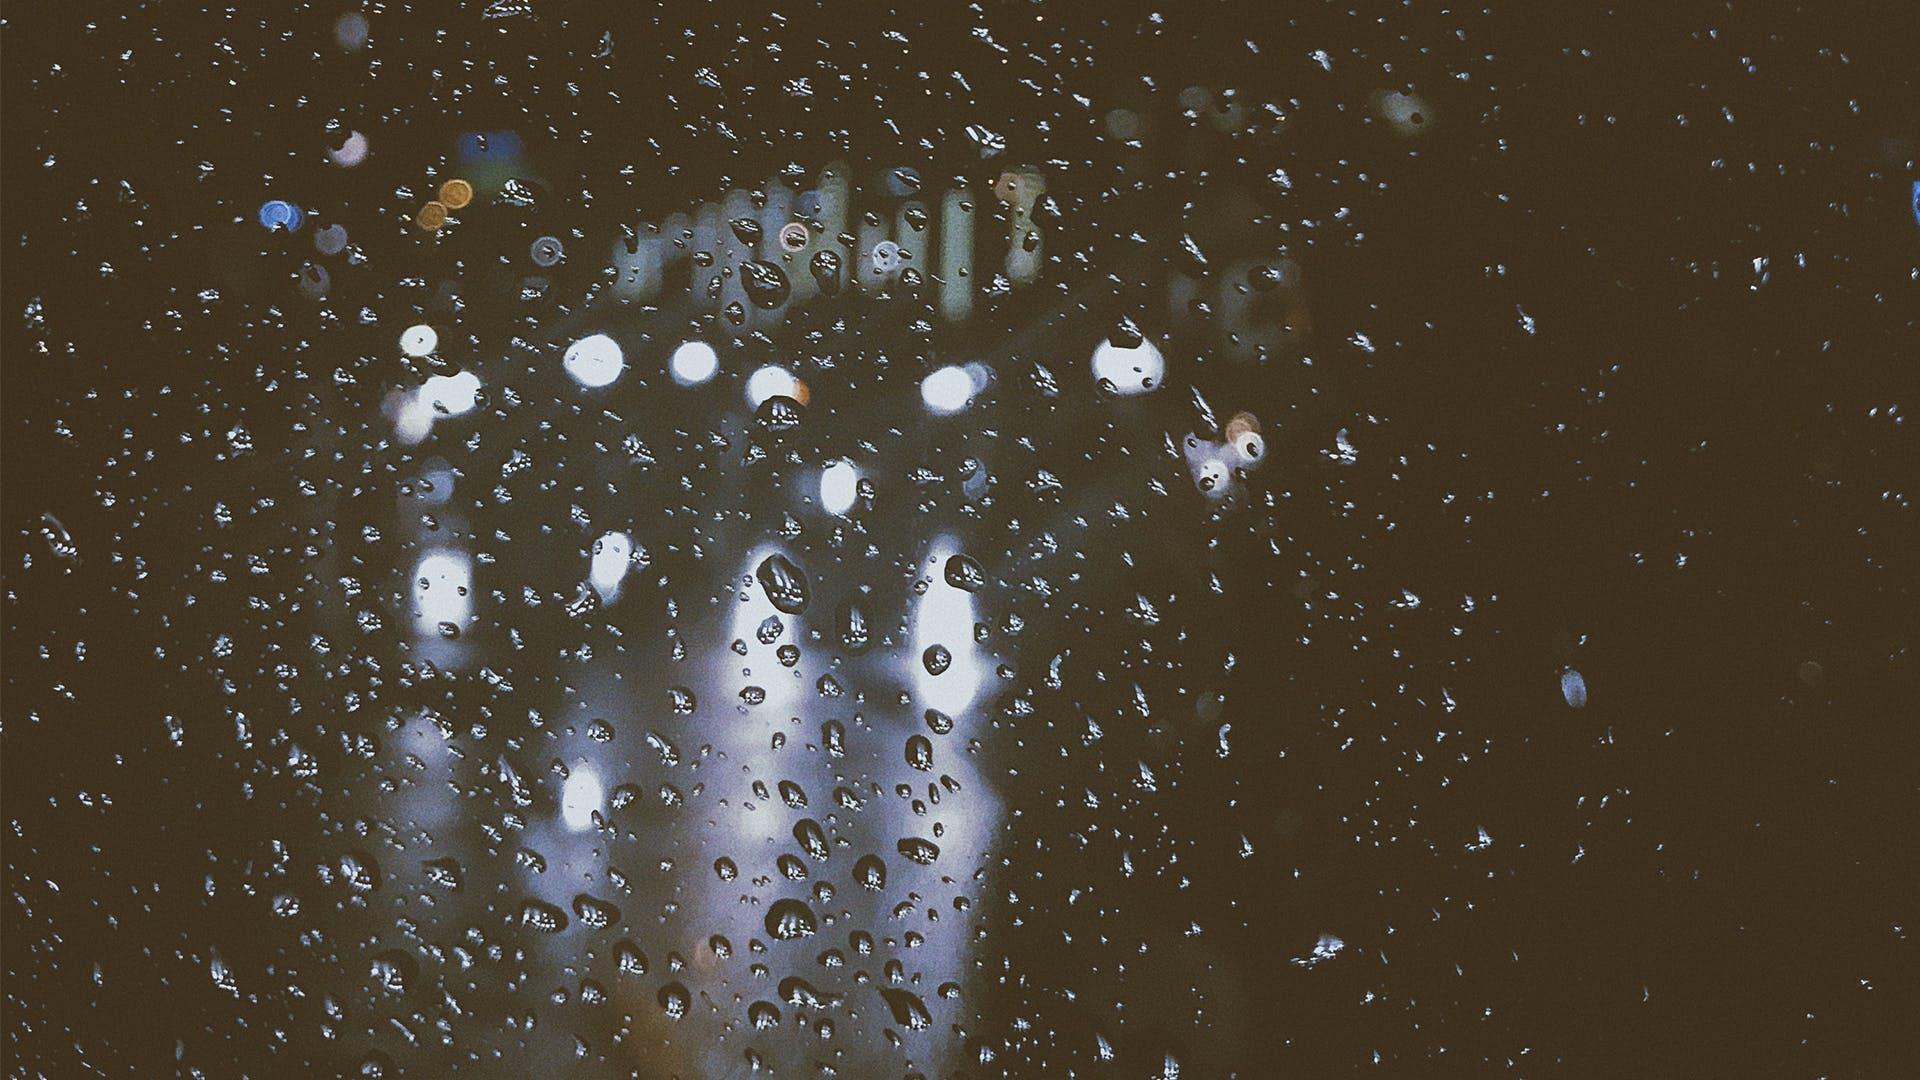 Bokeh Photography of Windowpane